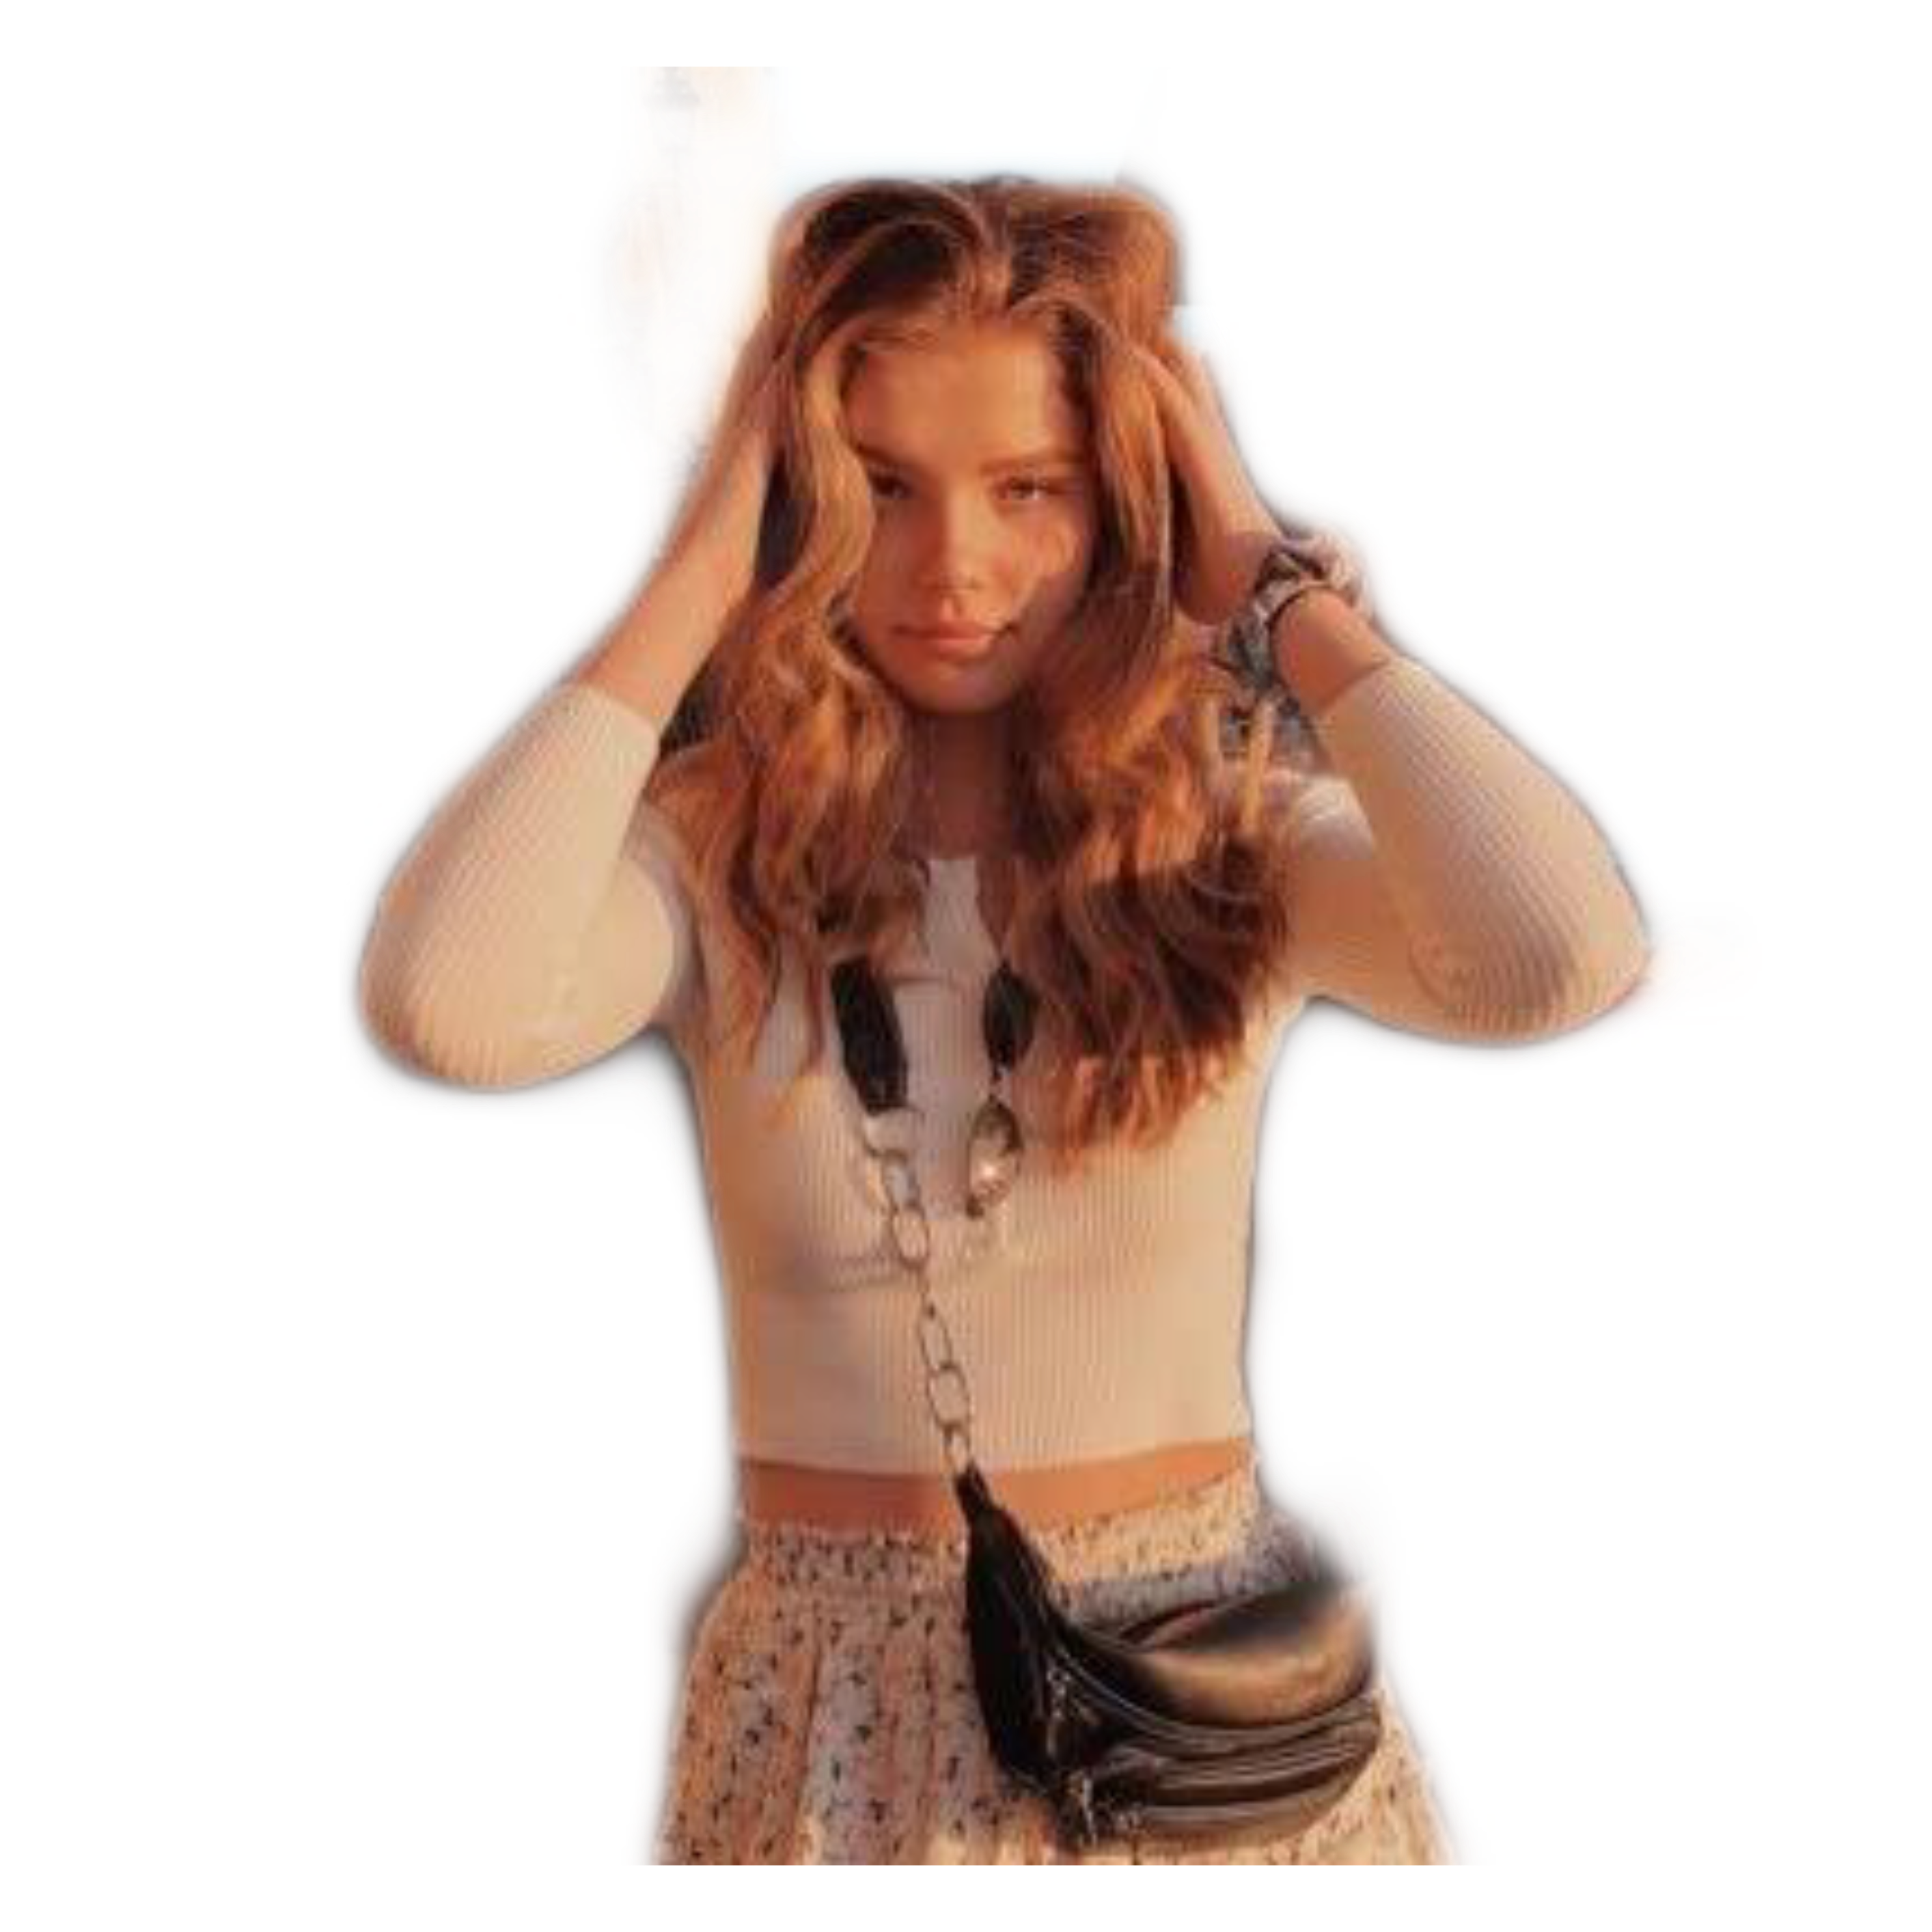 Ellie Elliethumann Hair Hands Pose Photo Instapic Freet